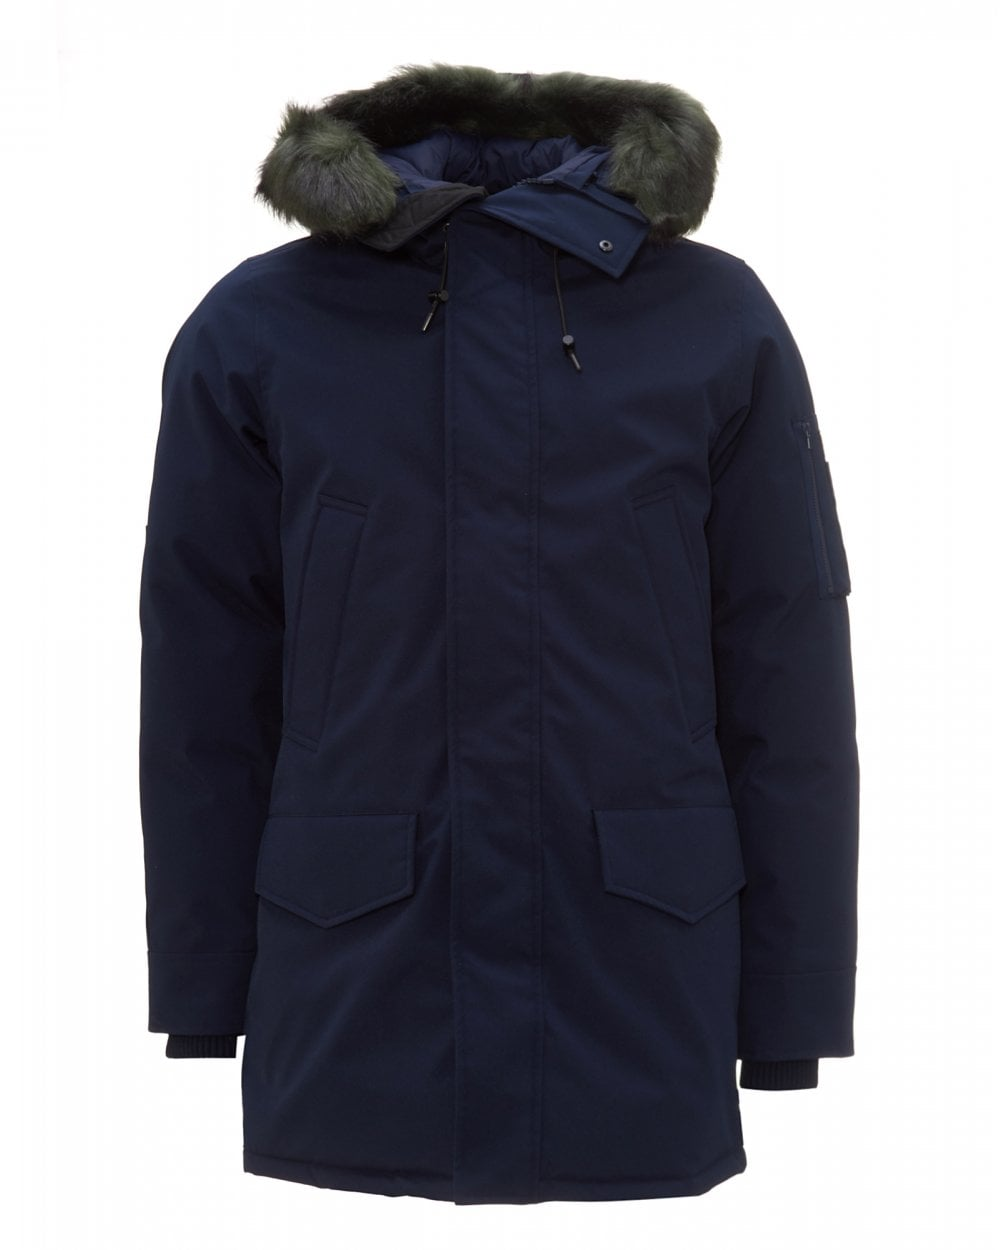 mens navy blue parka jacket